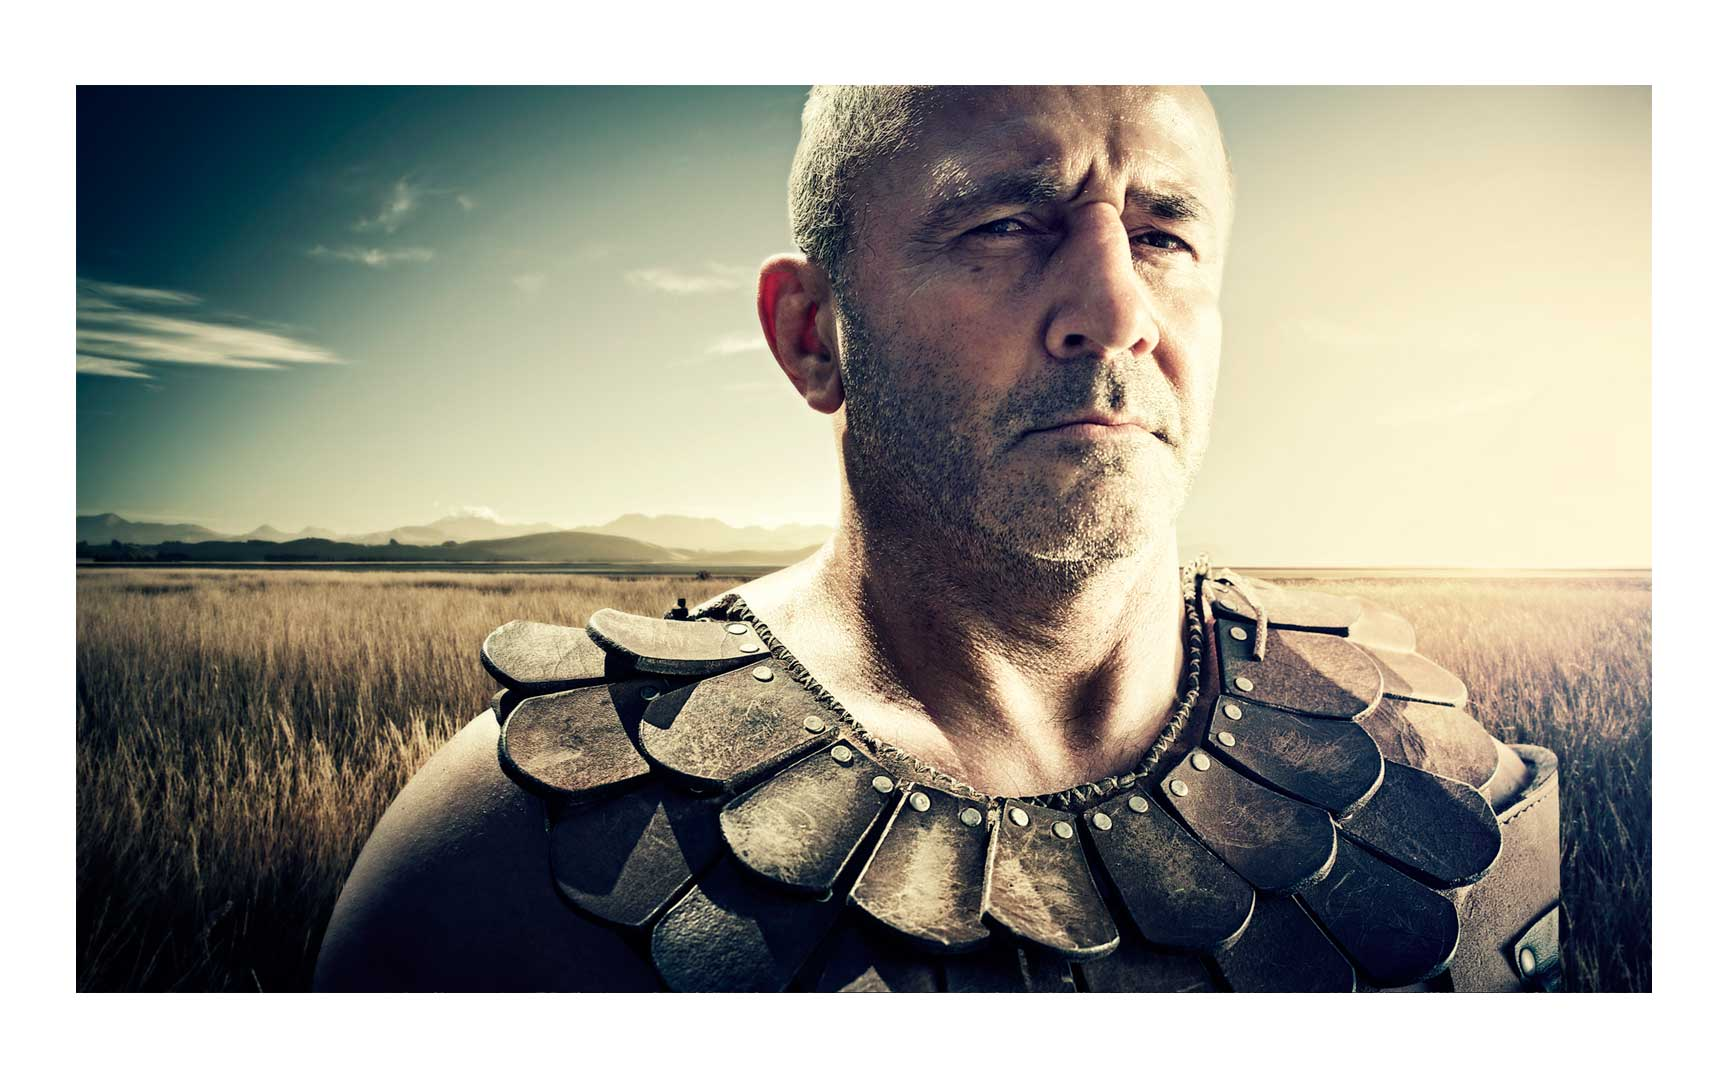 gladiatort